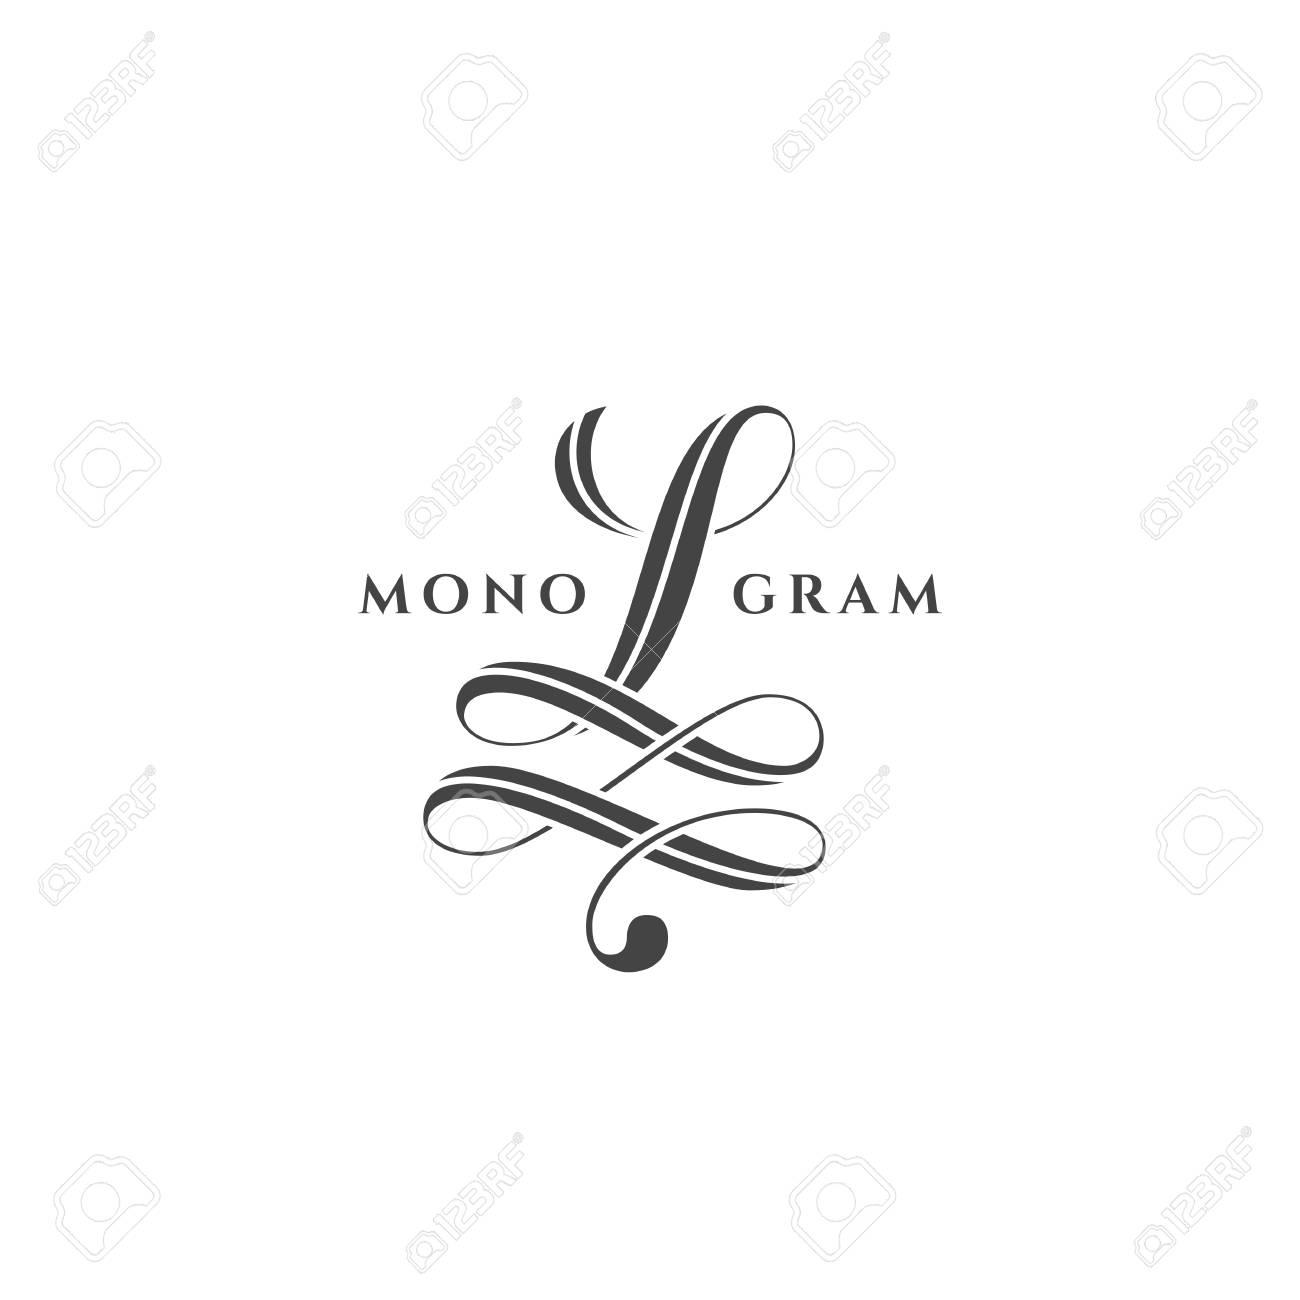 Monogram design template of letter L on a white background. Vector illustration. - 125472447